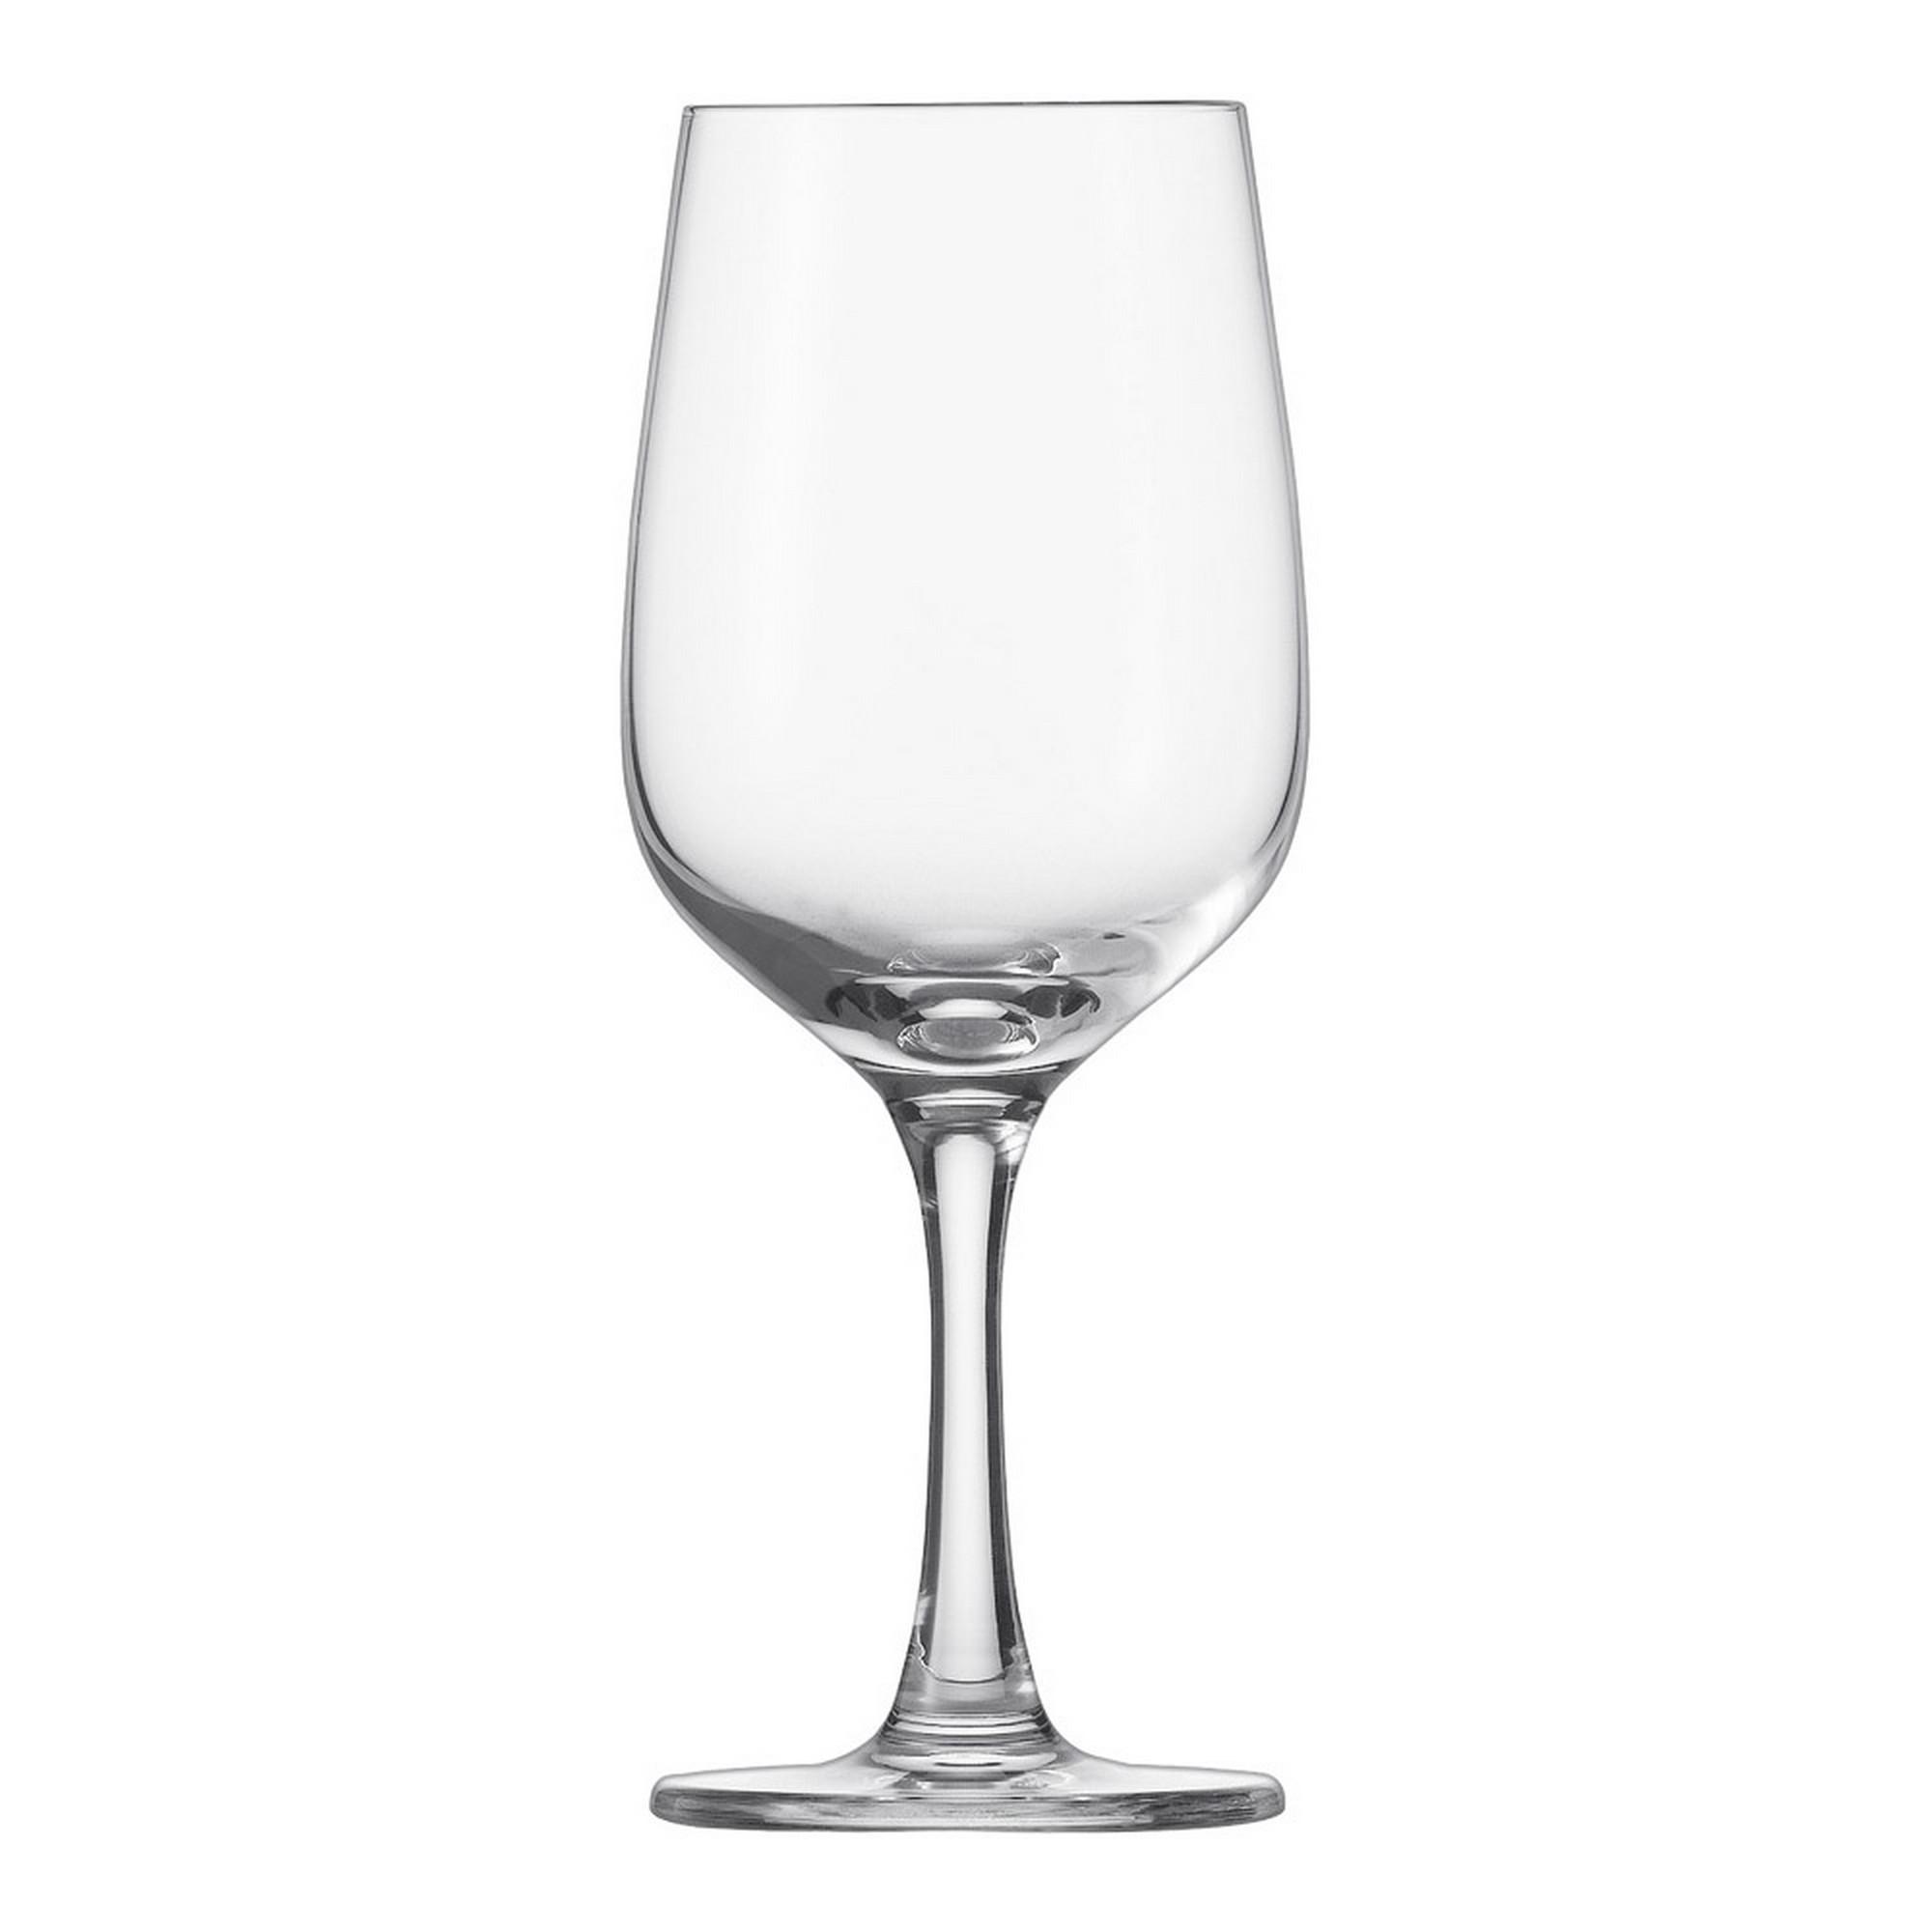 Taça para Vinho Branco 317ml Schott Zwiesel Congresso 6 Peças de Cristal